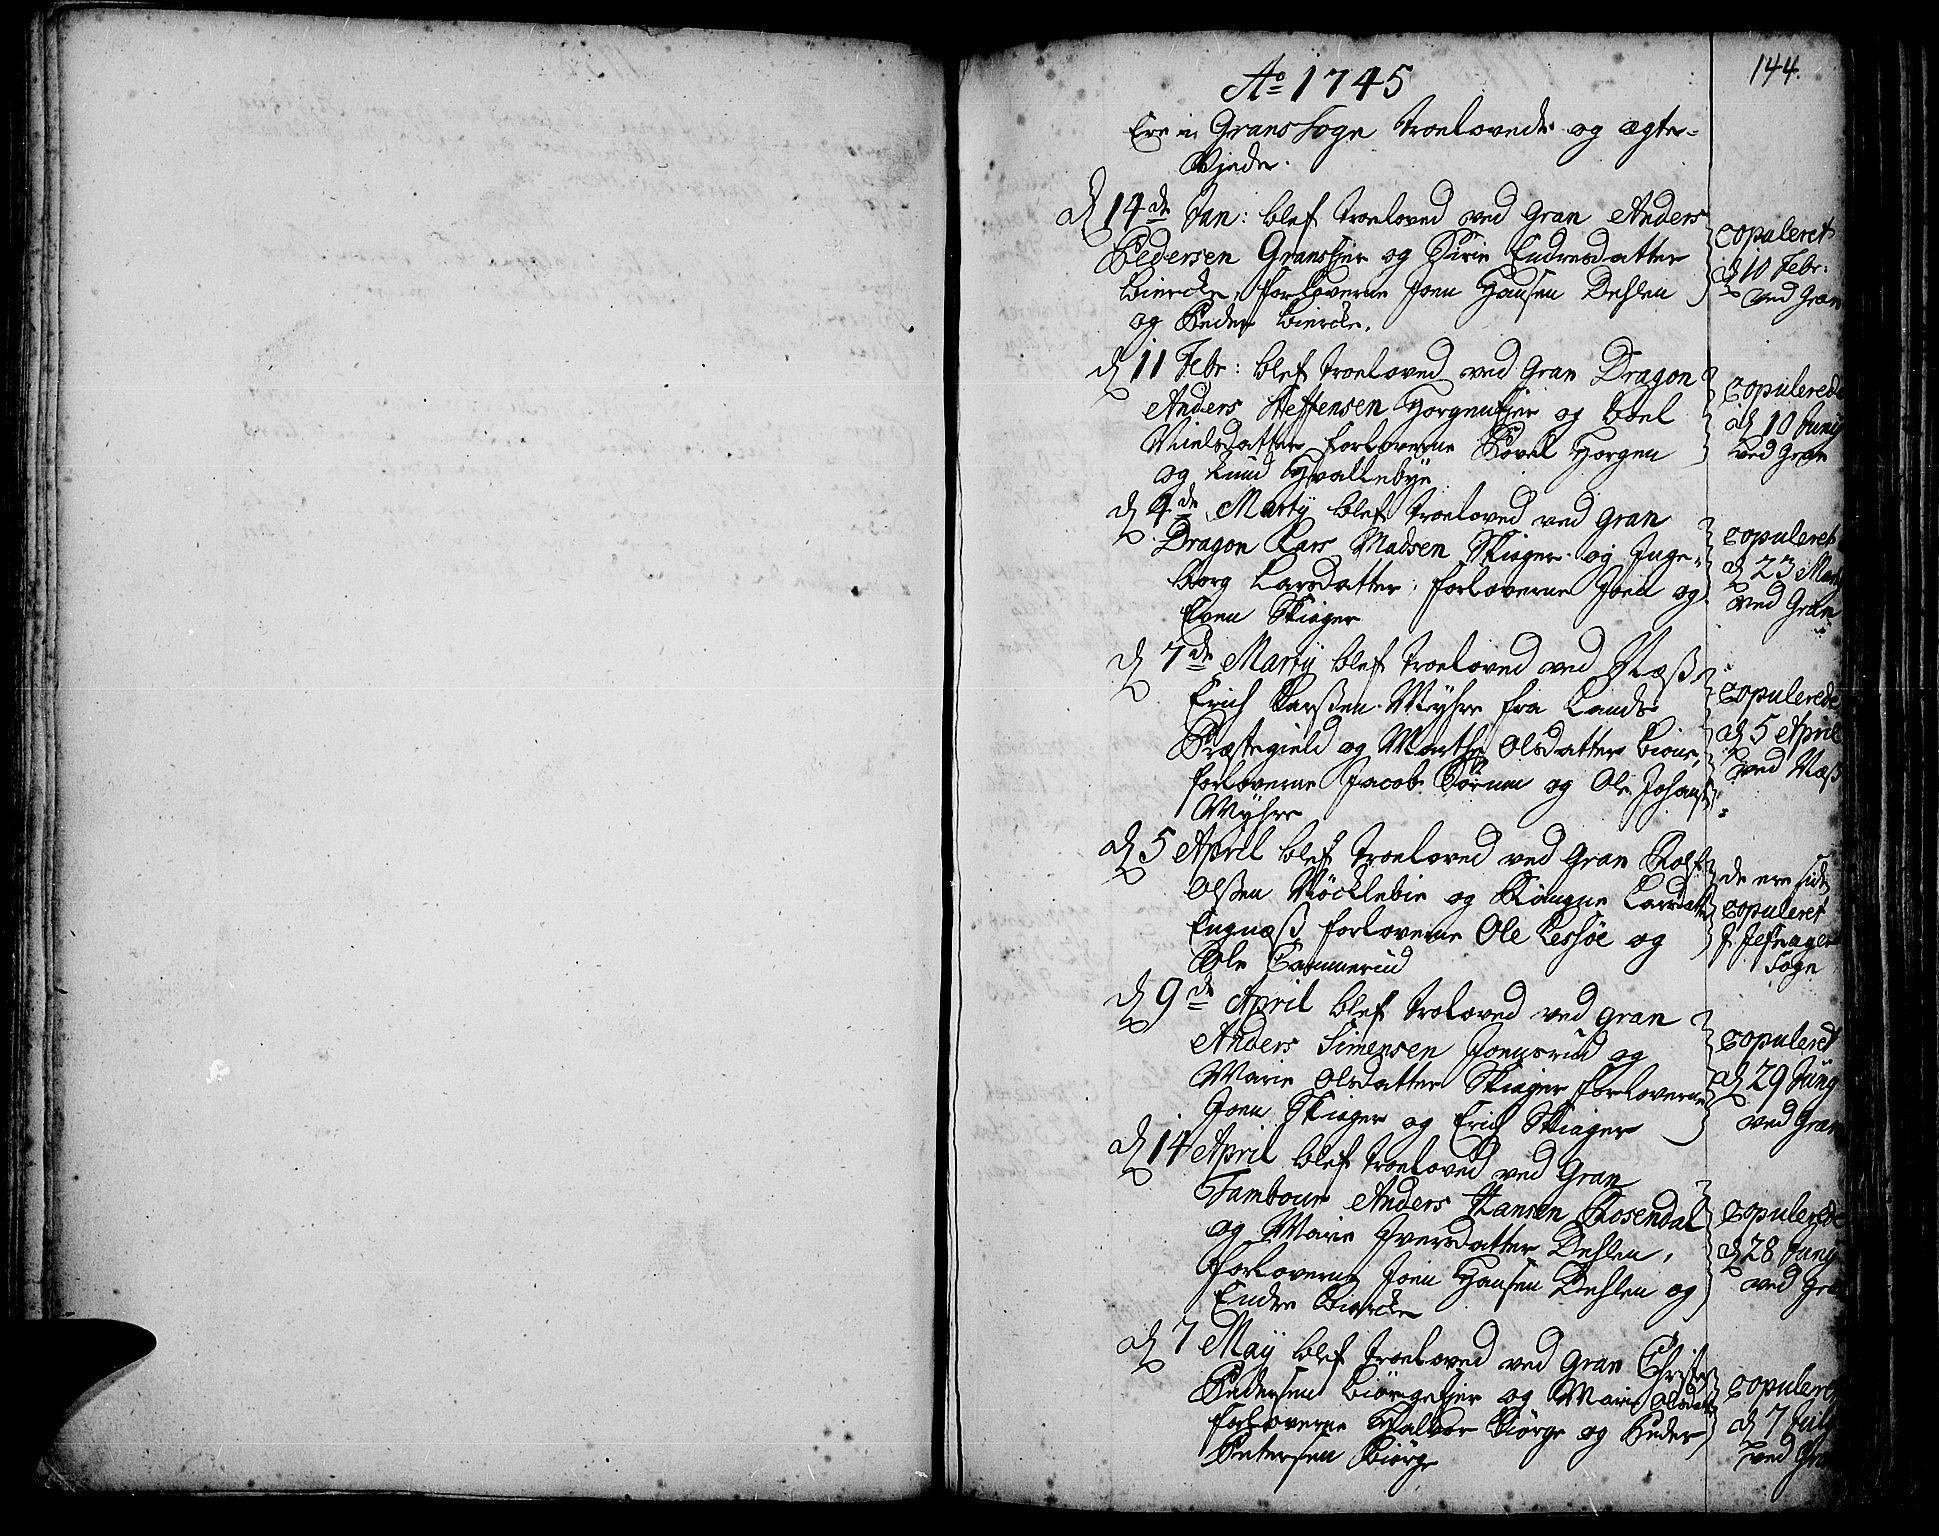 SAH, Gran prestekontor, Ministerialbok nr. 3, 1745-1758, s. 144